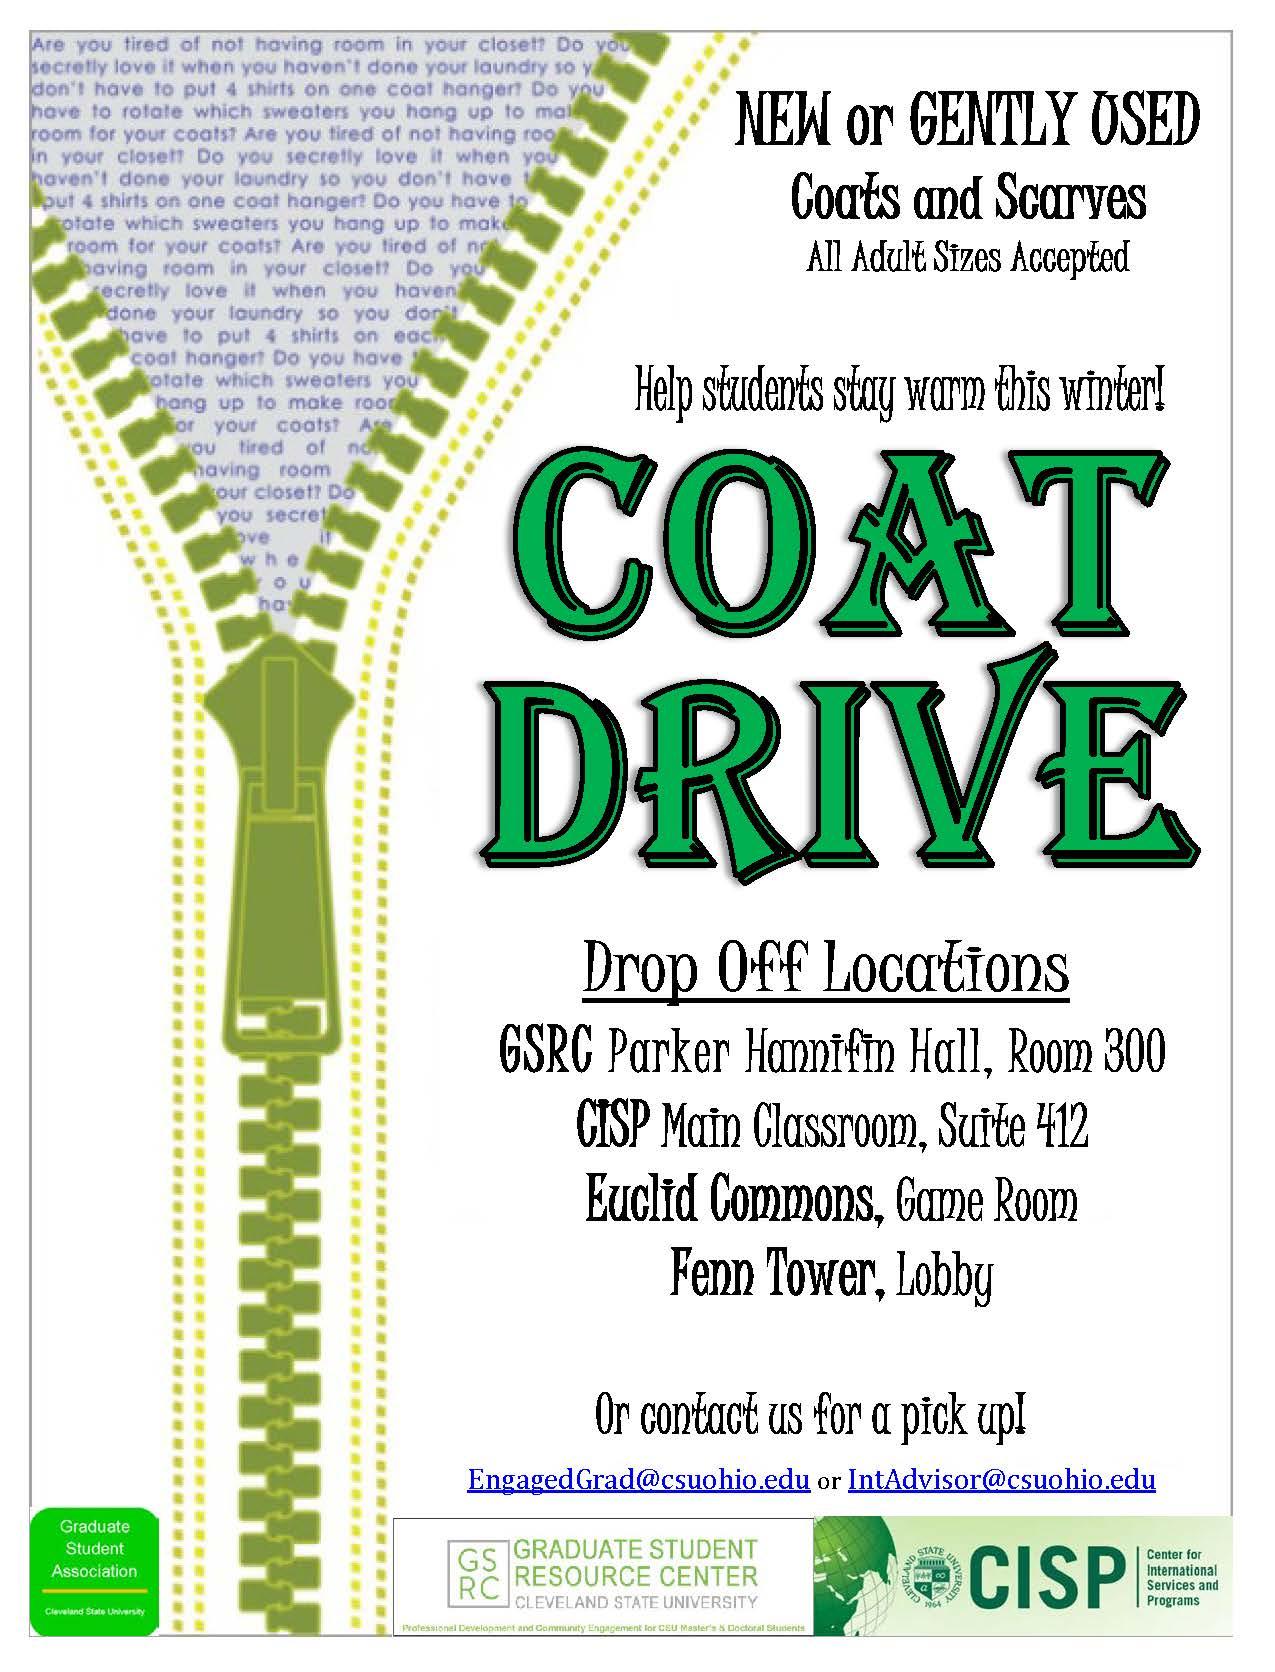 Grad Student Coat Drive | Cleveland State University